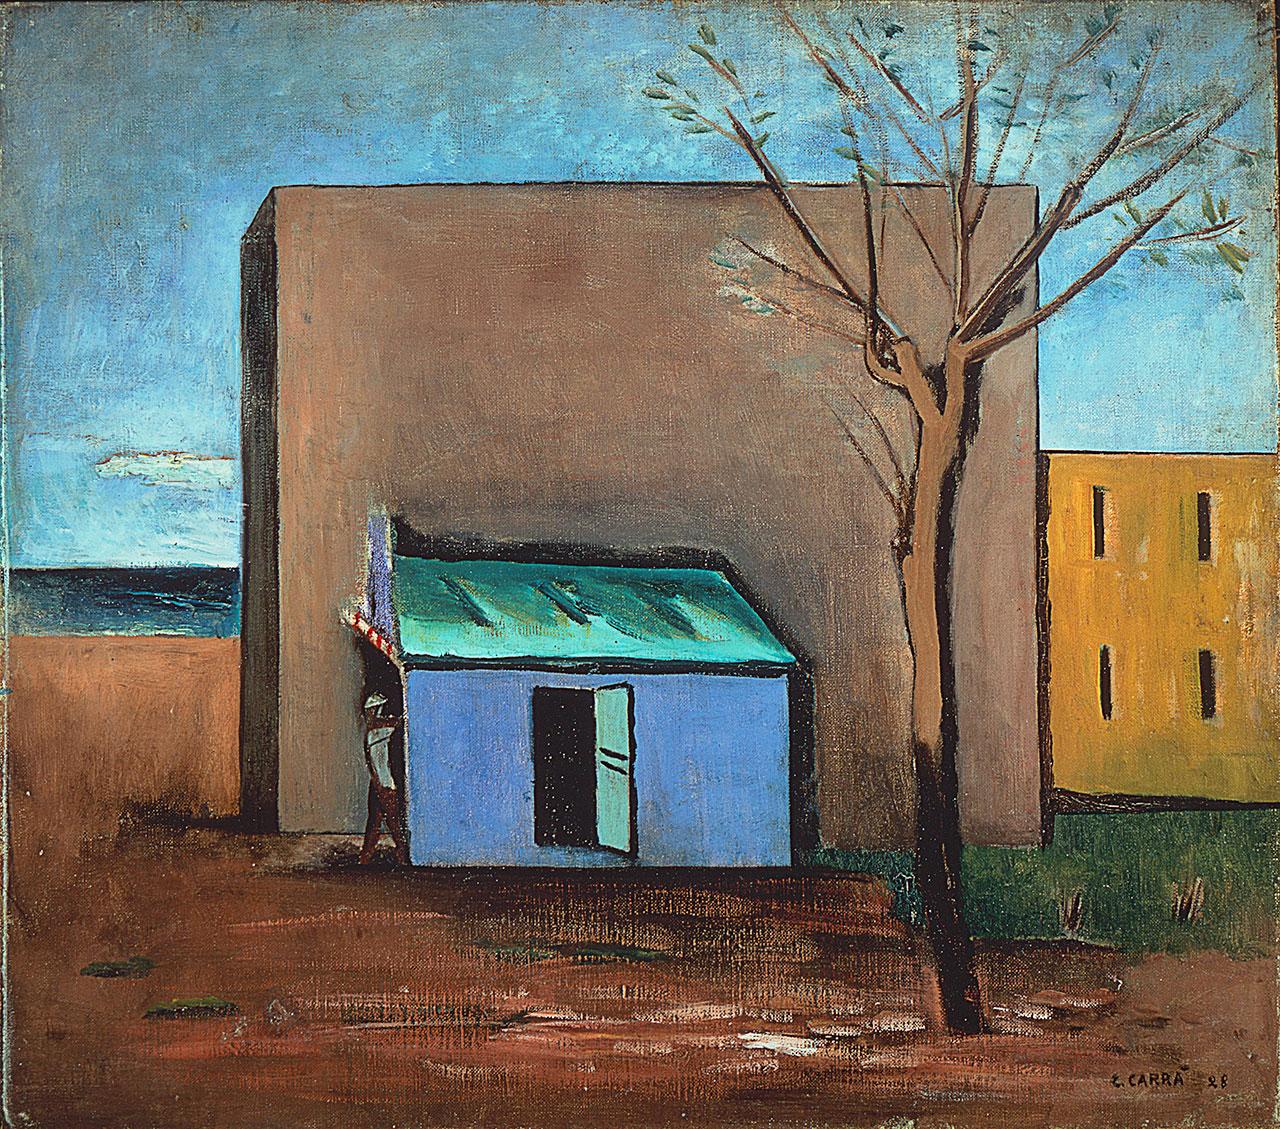 Carlo Carrà, Il bersaglio, 1928, oil on canvas. 75,0 x 85,0 cm. Photographic Studio Luca Carrà © Carlo Carrà by SIAE 2018.